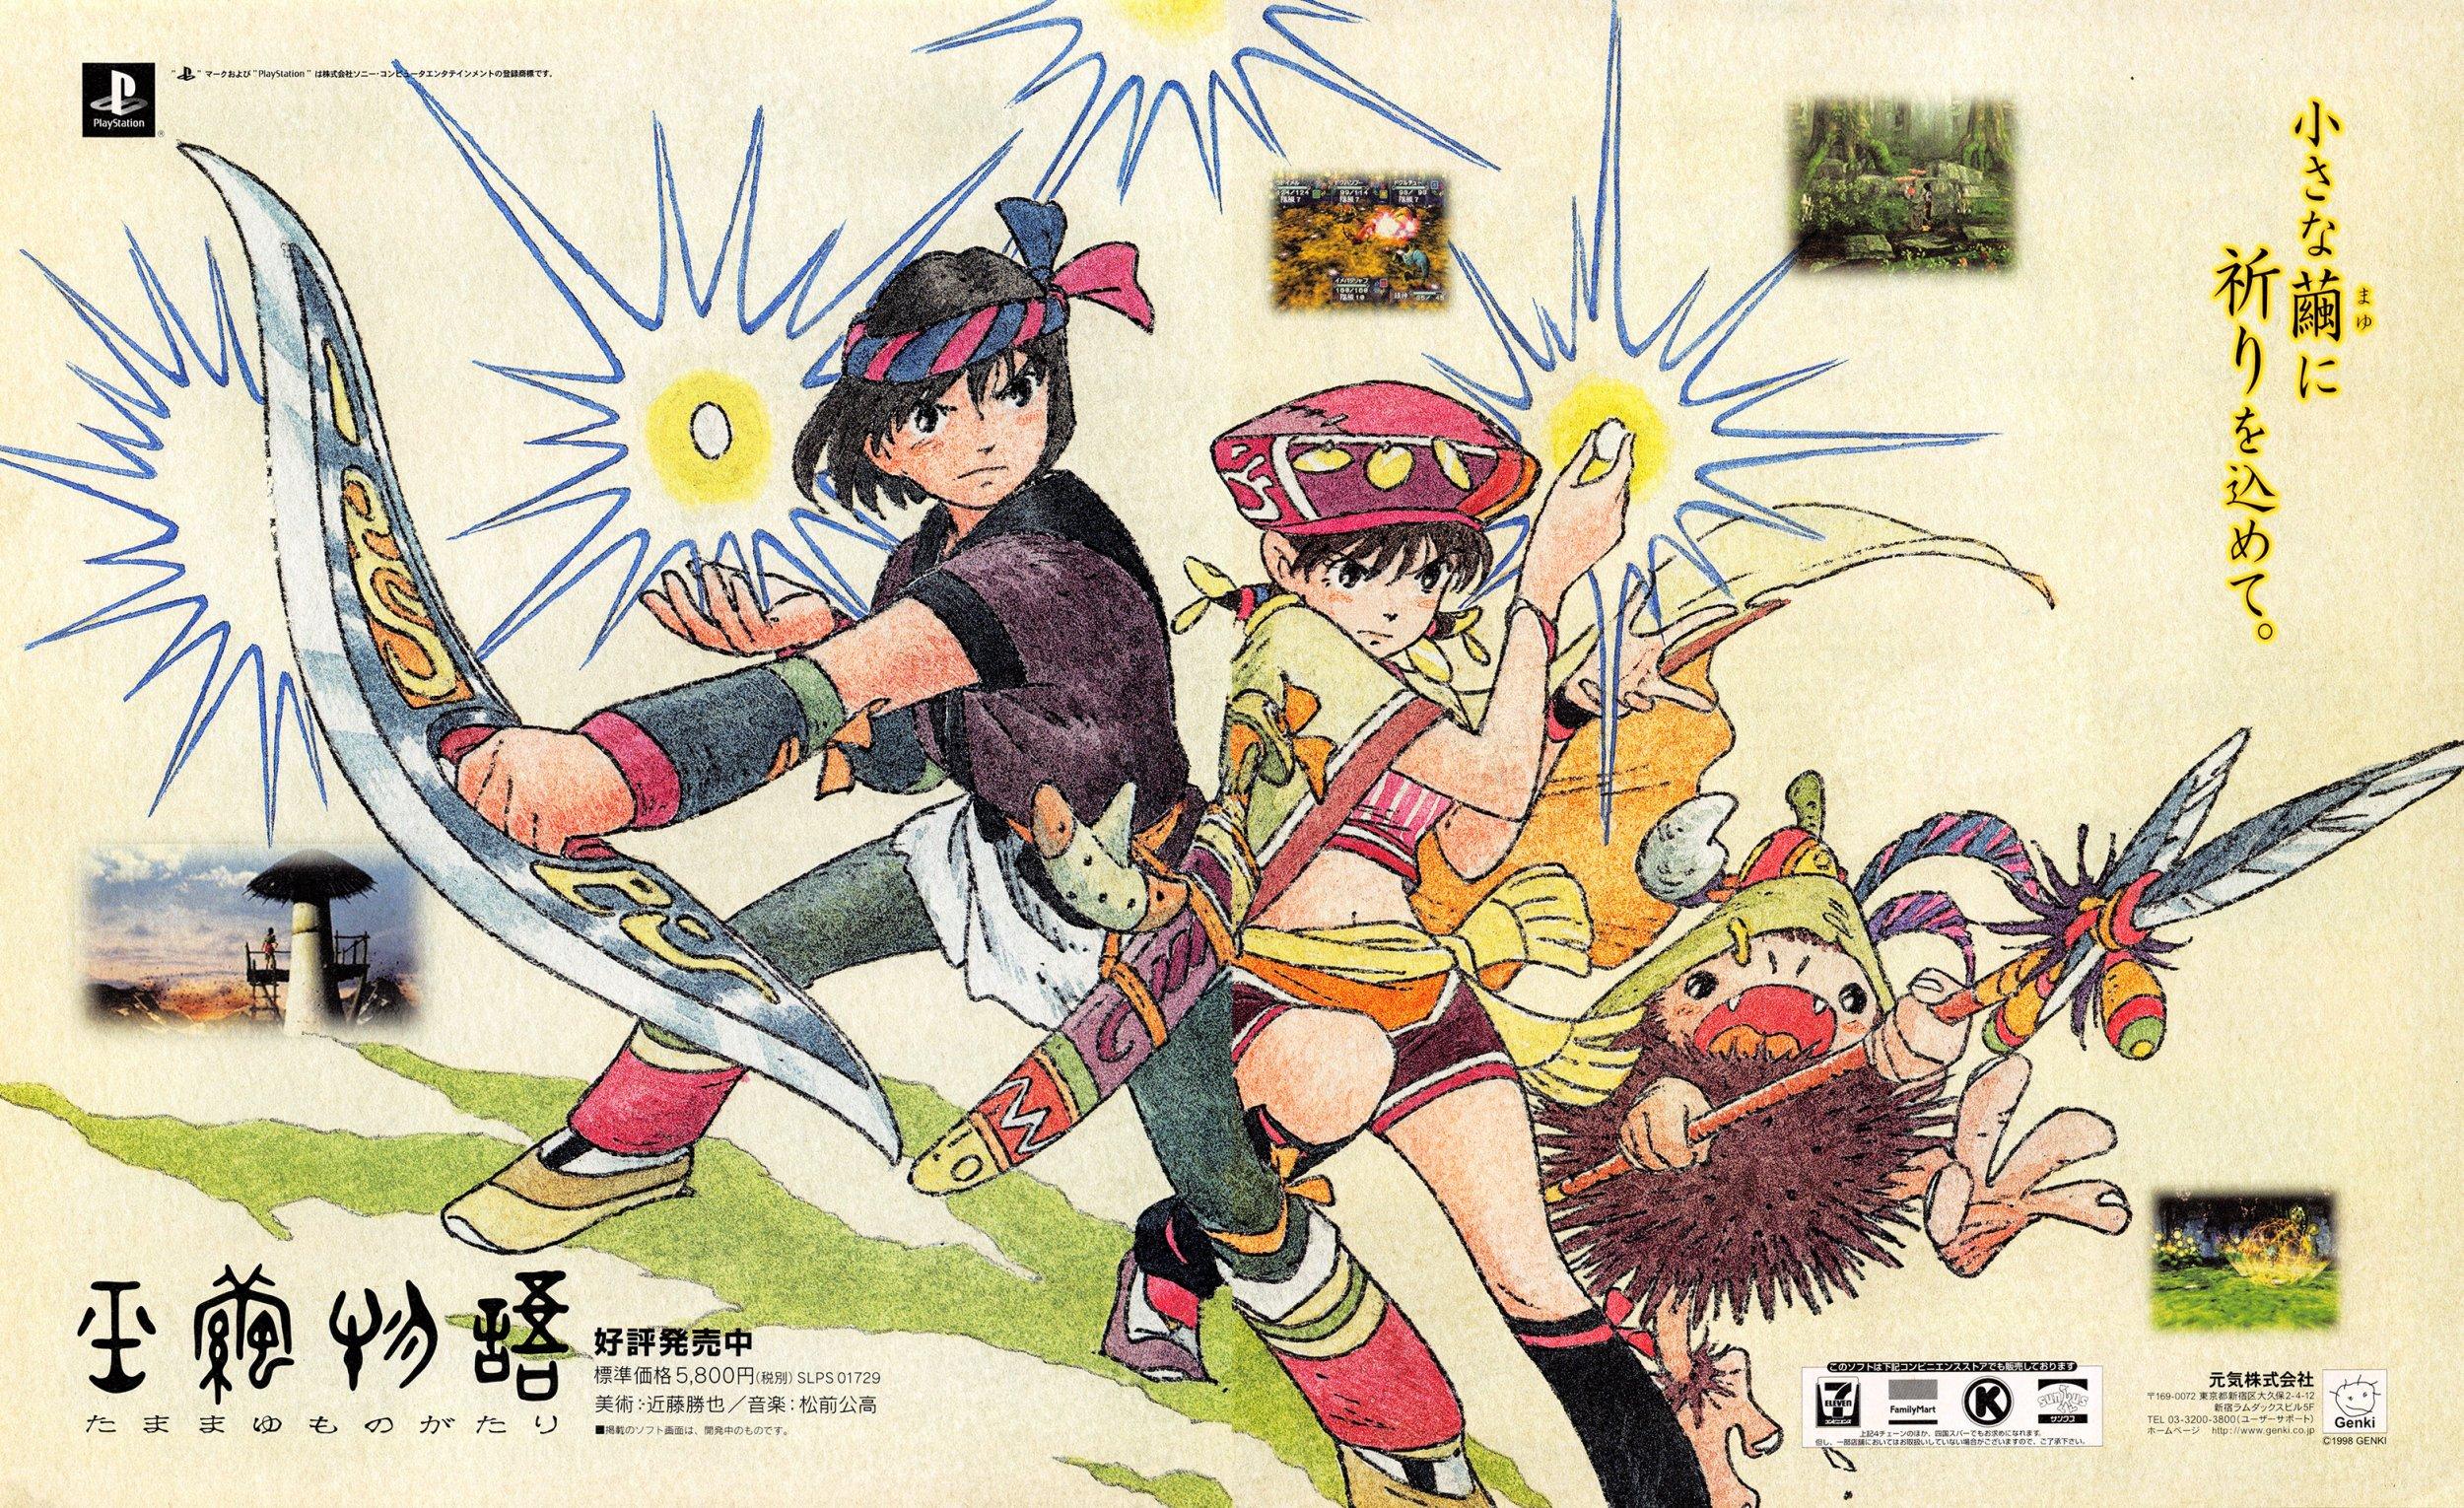 Jade Cocoon: Story of the Tamamayu (Japan)